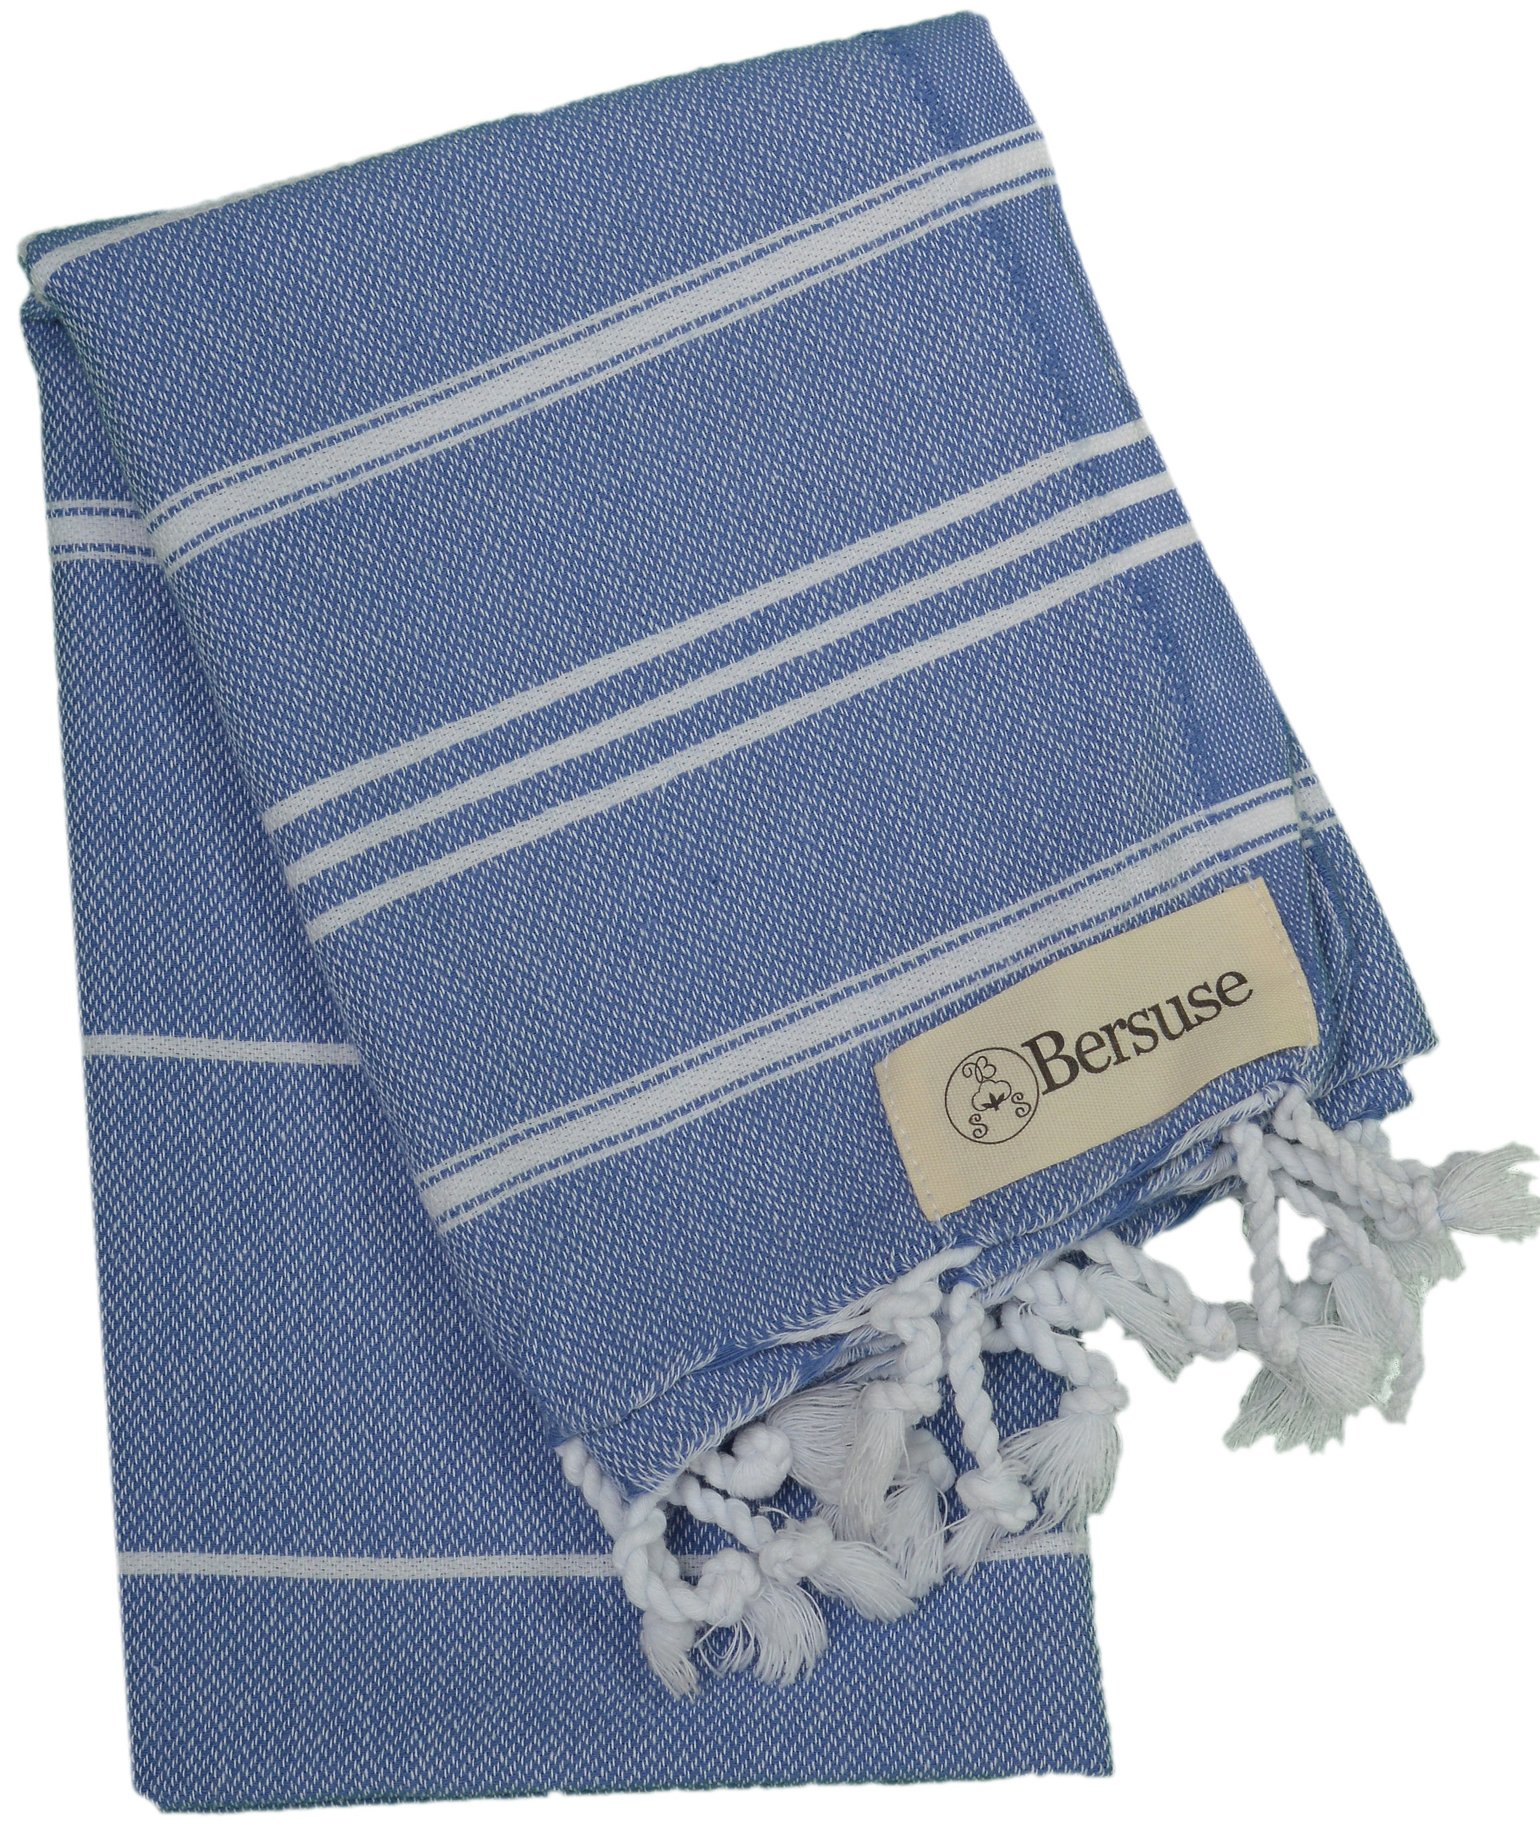 Bersuse 100% Cotton - Anatolia Hand Turkish Towel Pestemal - Baby Care Kitchen Tea Dish Washcloth - Travel Gym Head Hair Face Peshtemal - Classic Striped - 22X35 Inches, Grey Blue